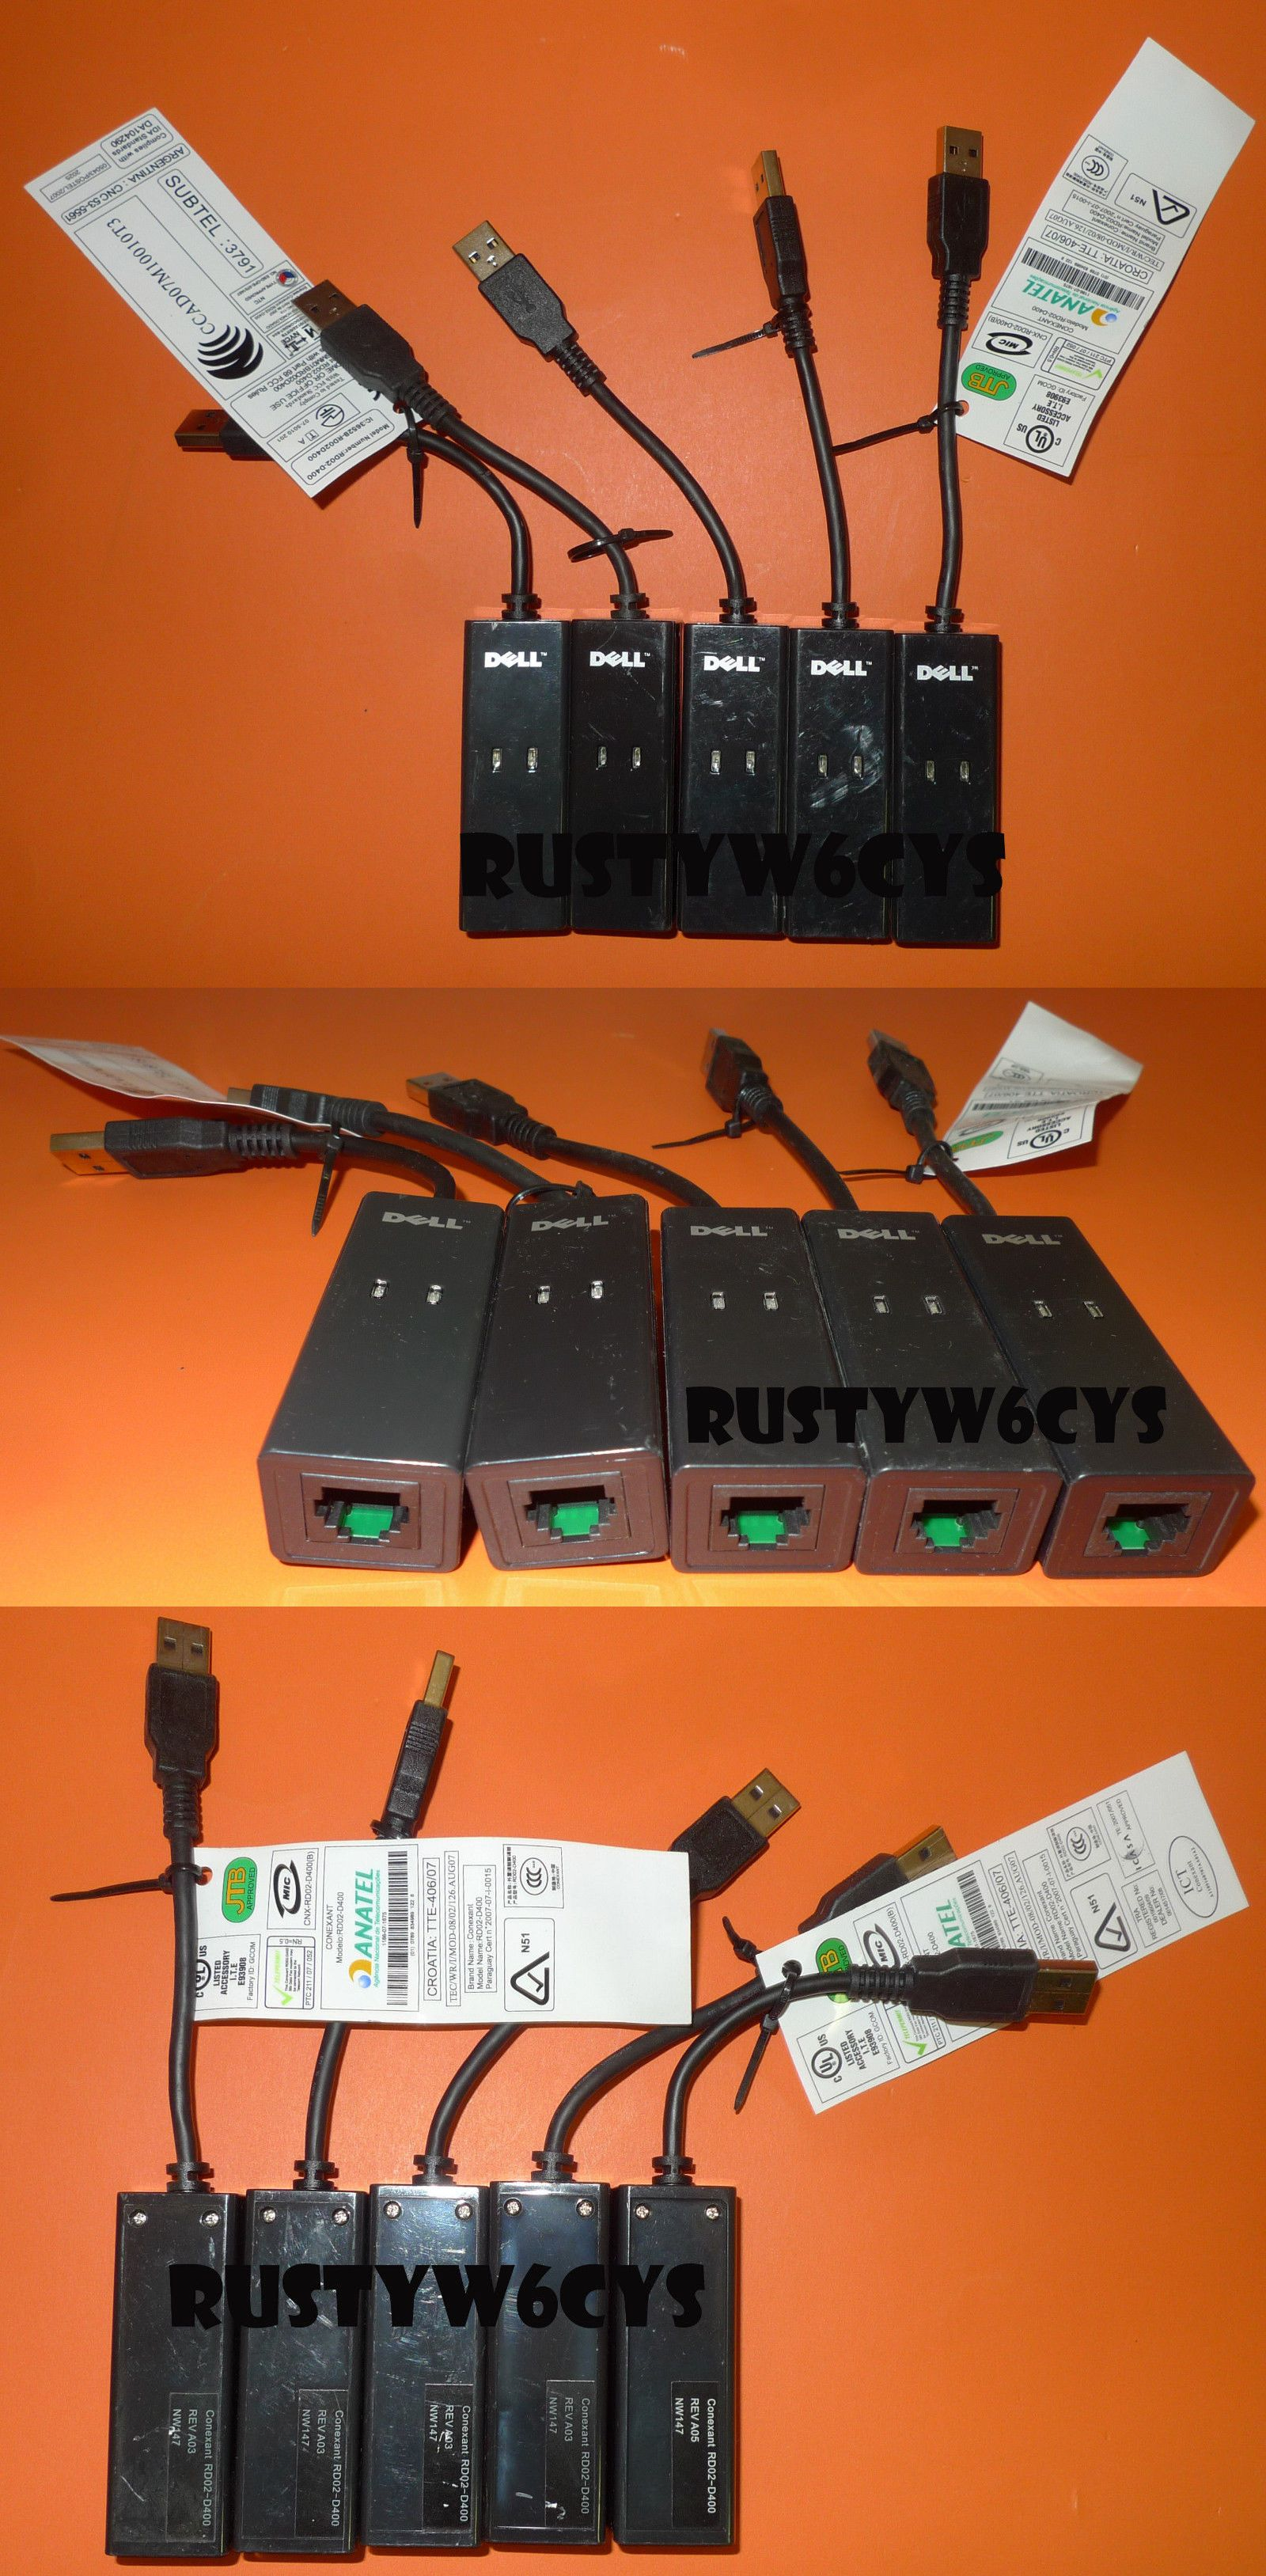 DELL CONEXANT RD02-D400 USB MODEM TELECHARGER PILOTE